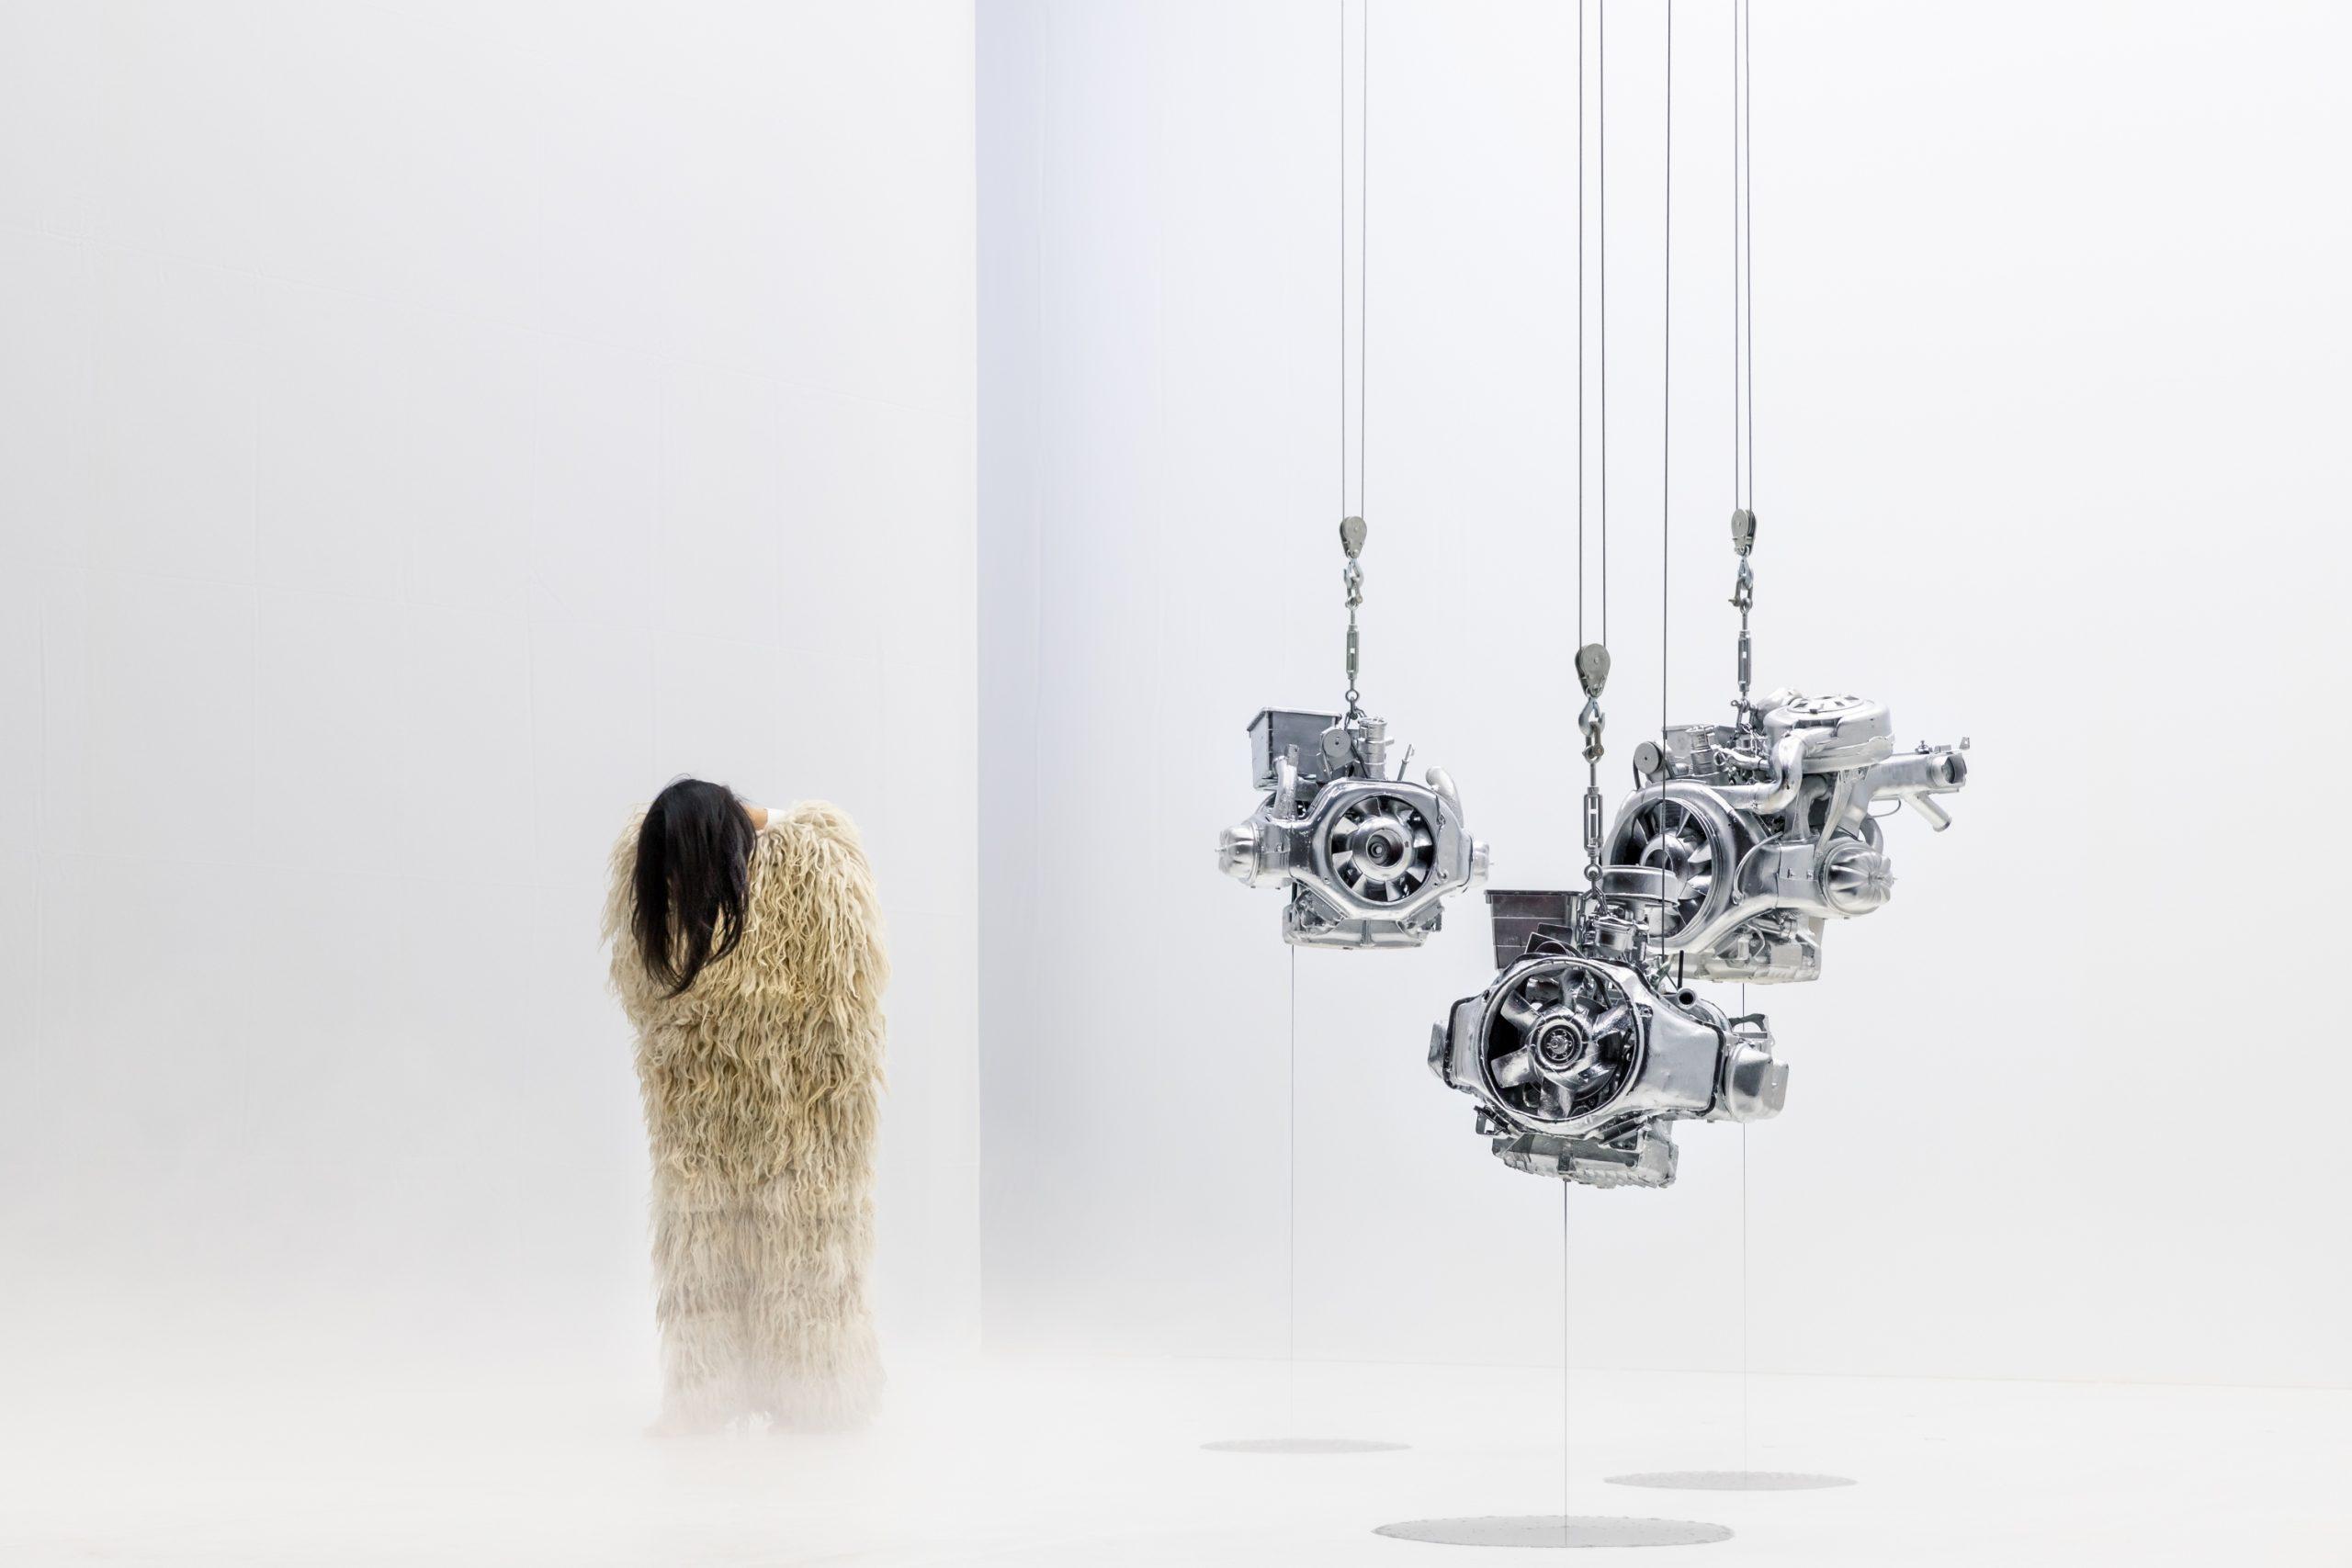 elektronikus-opera a-Trafoban